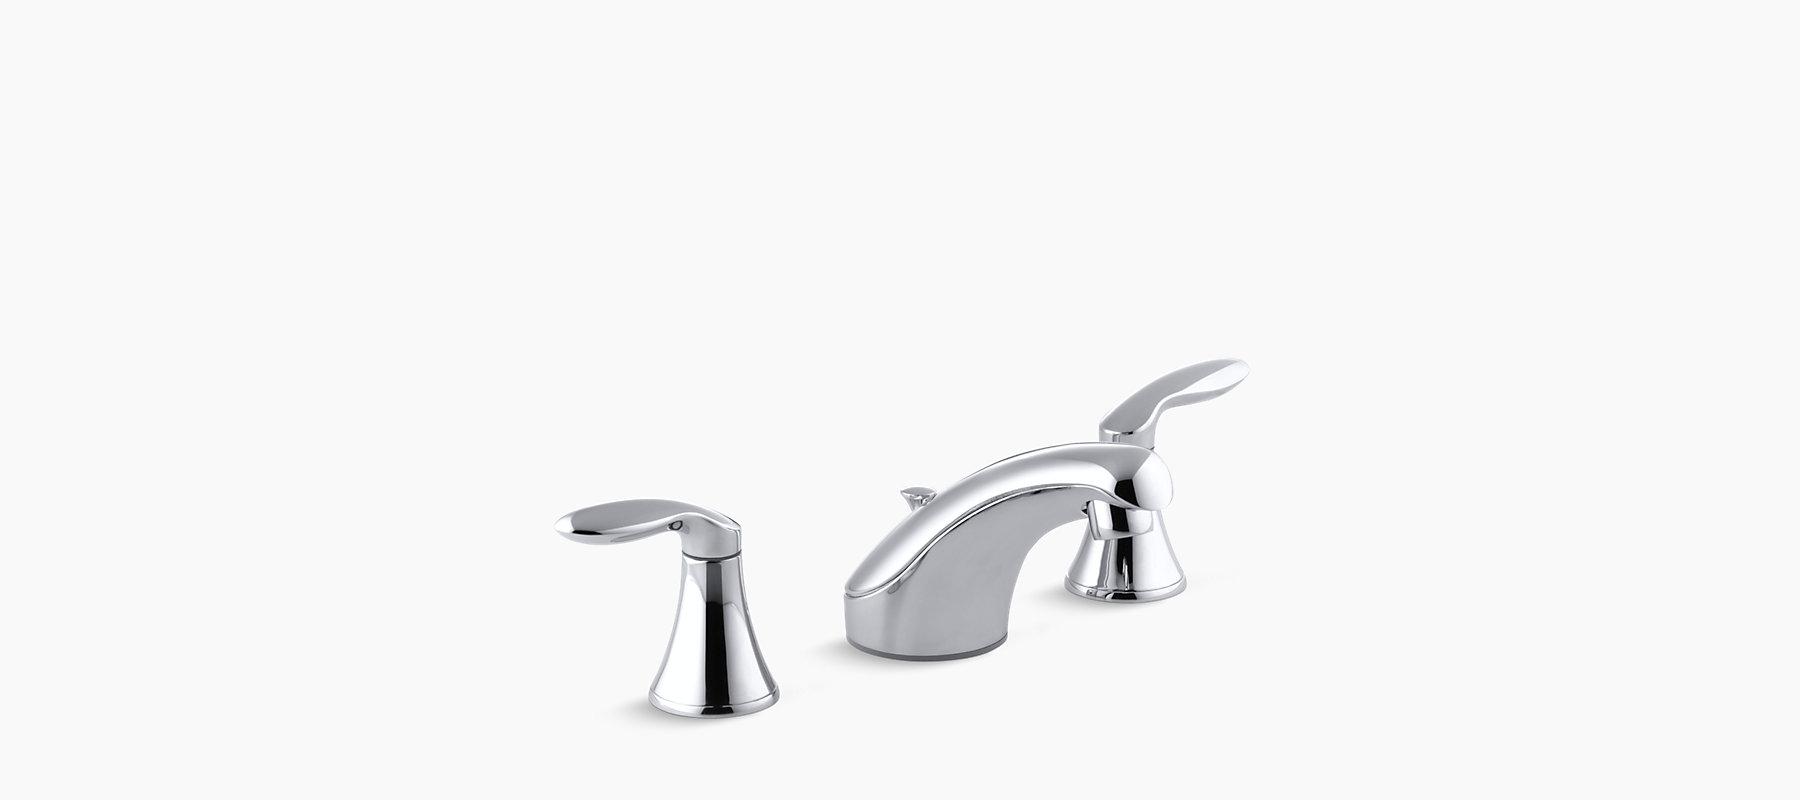 Coralais Widespread Bathroom Sink Faucet K 15261 4 Kohler